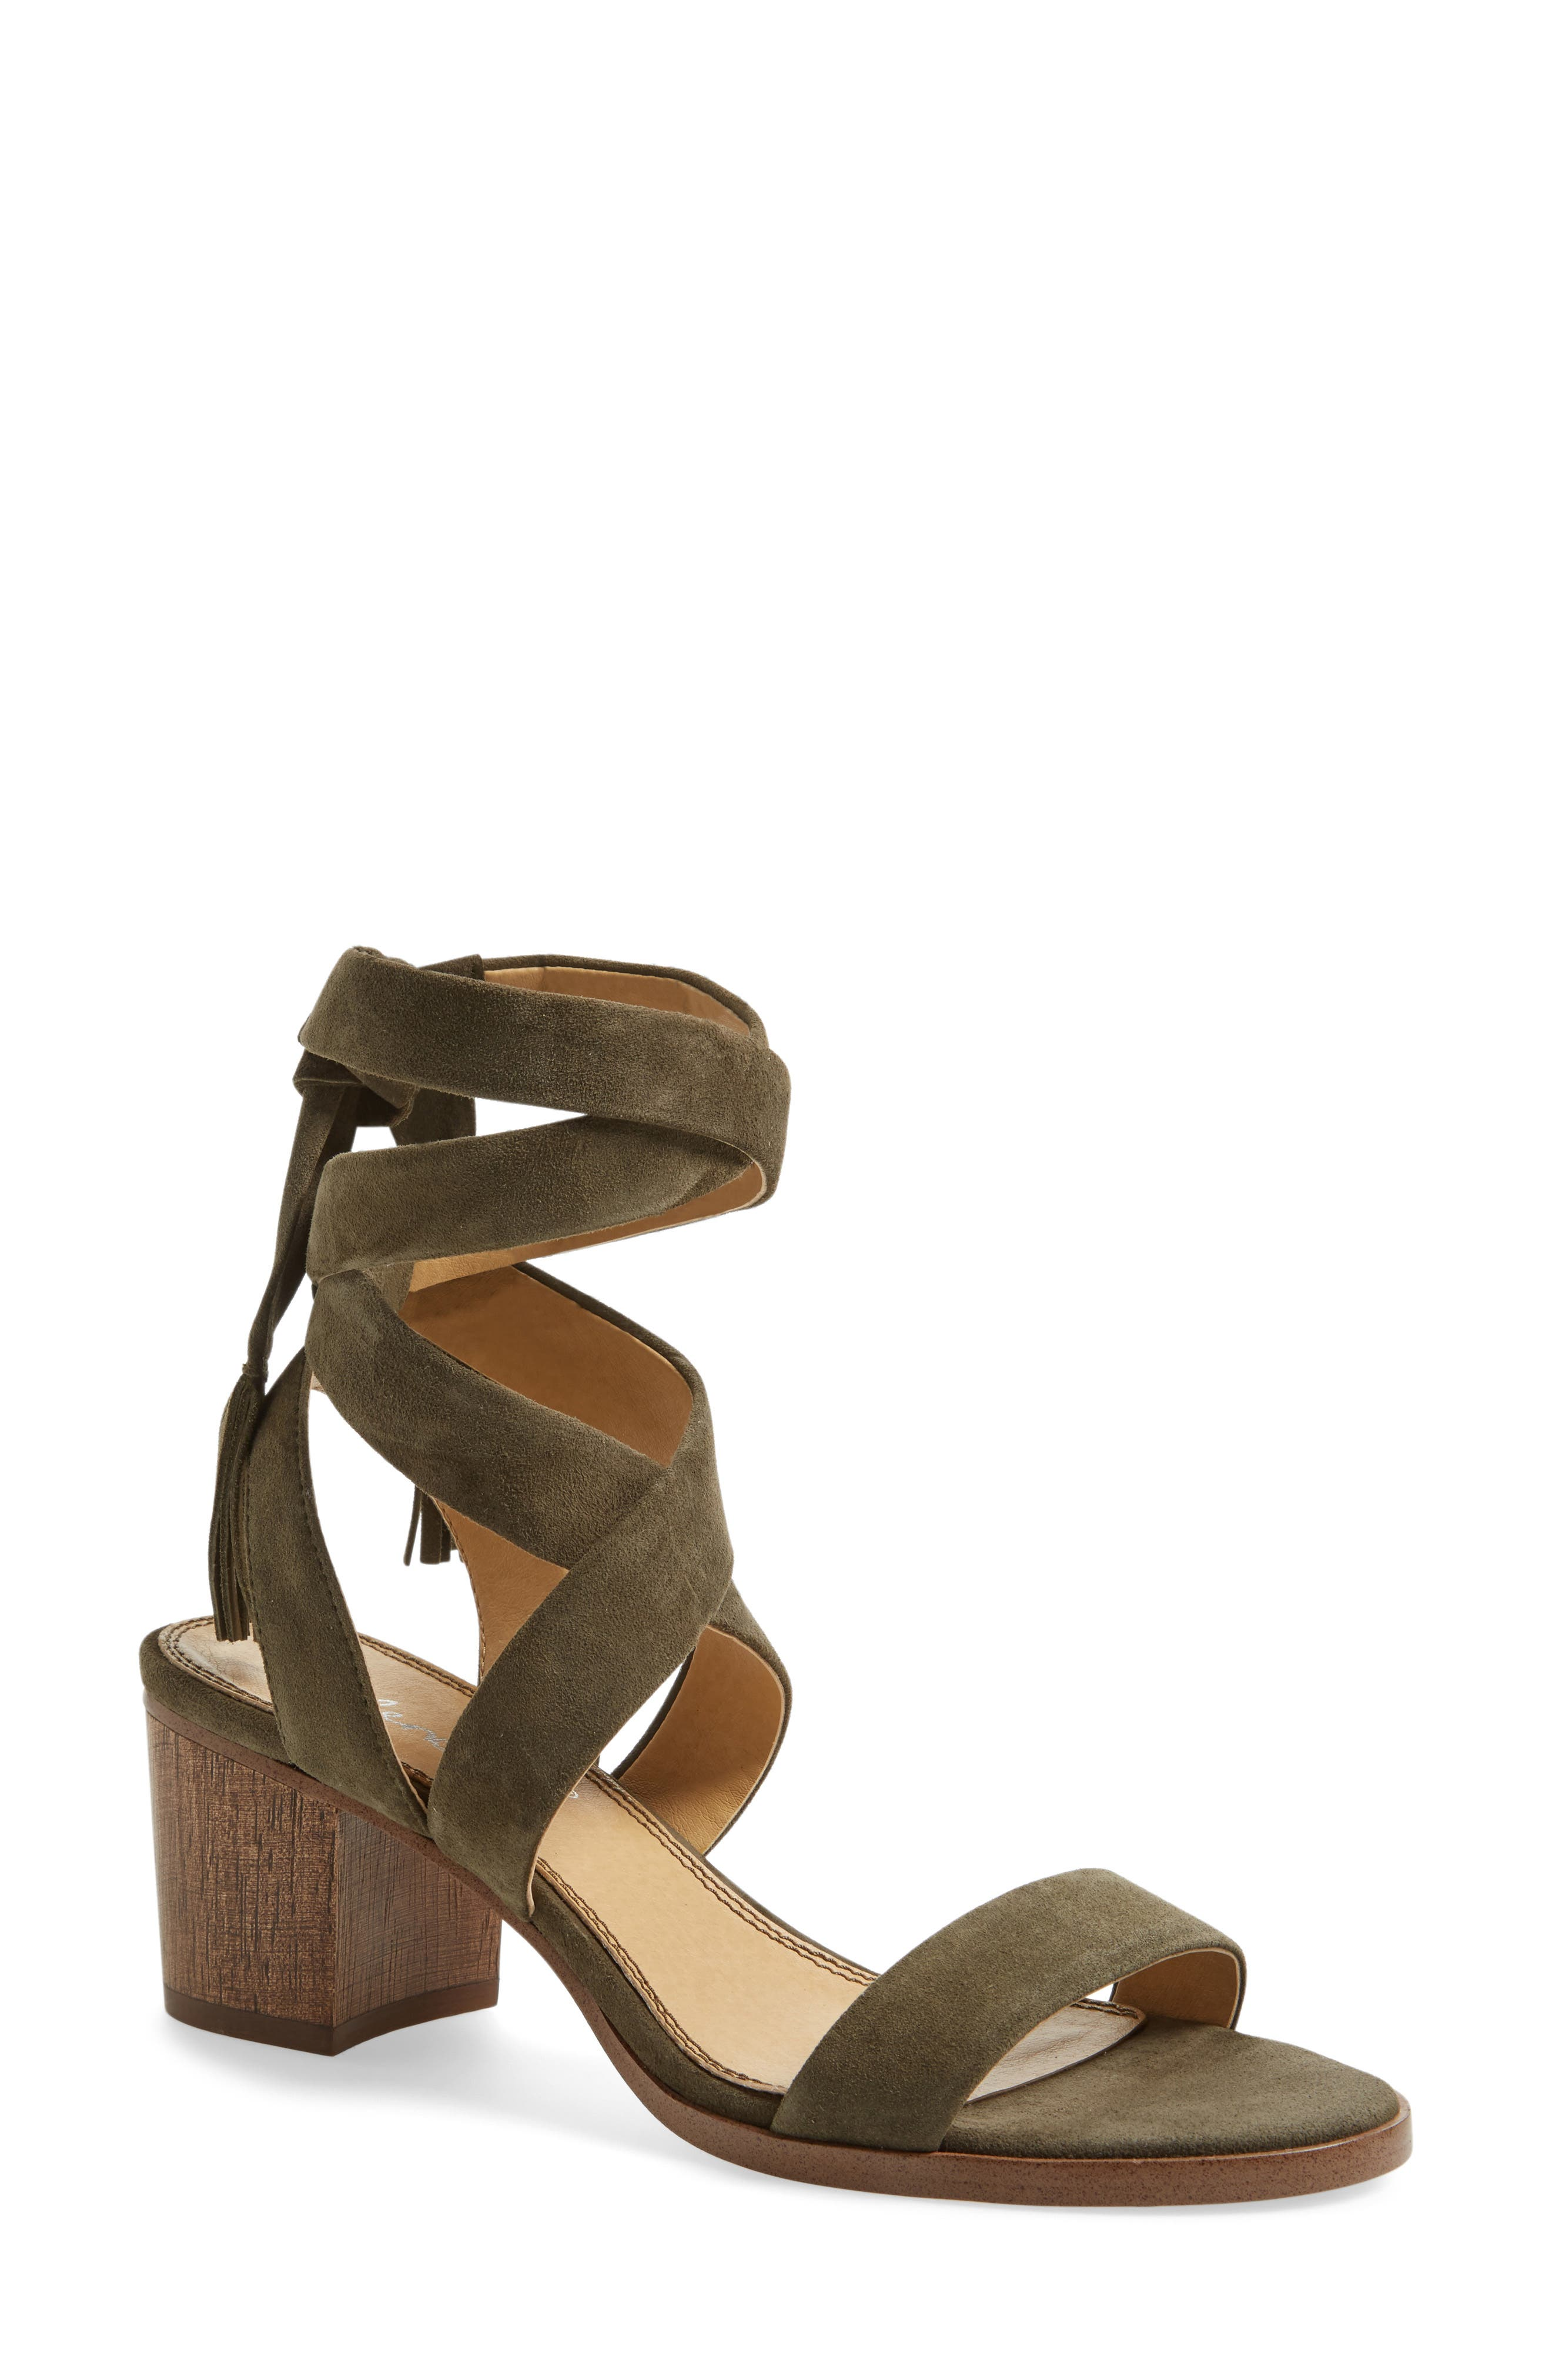 Main Image - Splendid Janet Block Heel Sandal (Women)